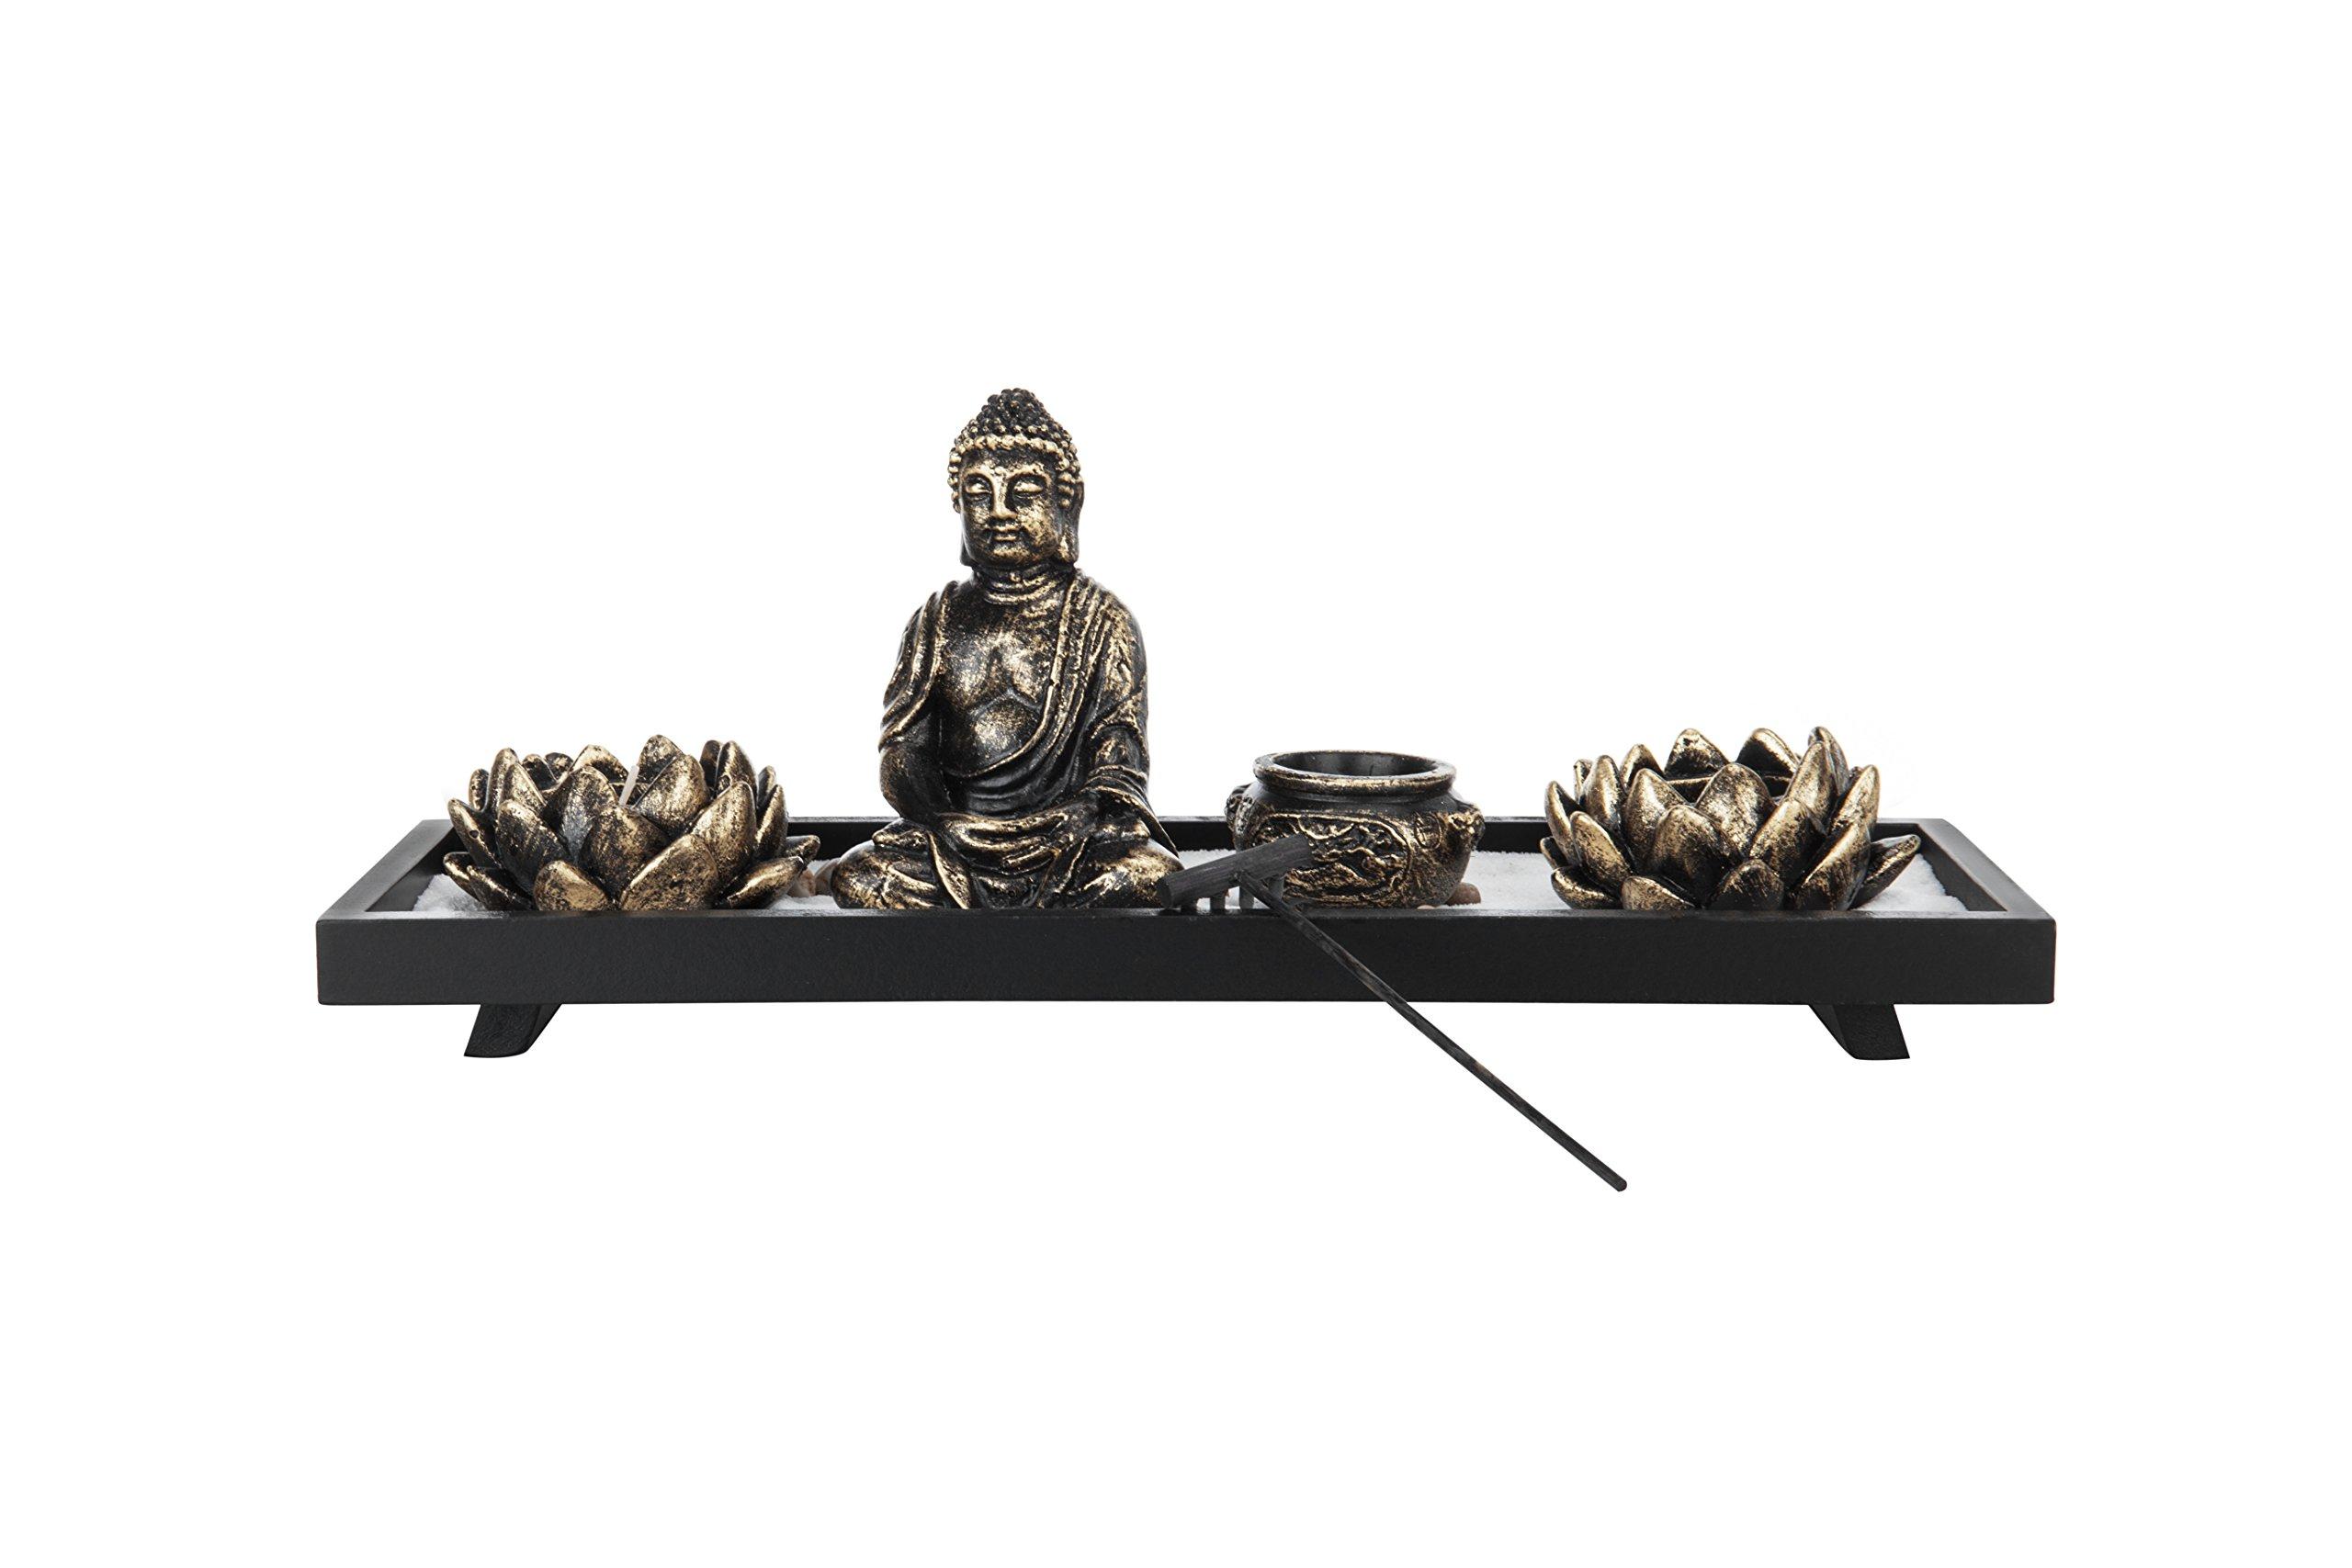 MyGift Home Zen Garden Set - Buddha Statue/Lotus Tea Light Candle Holder/Incense Burner Holder by MyGift